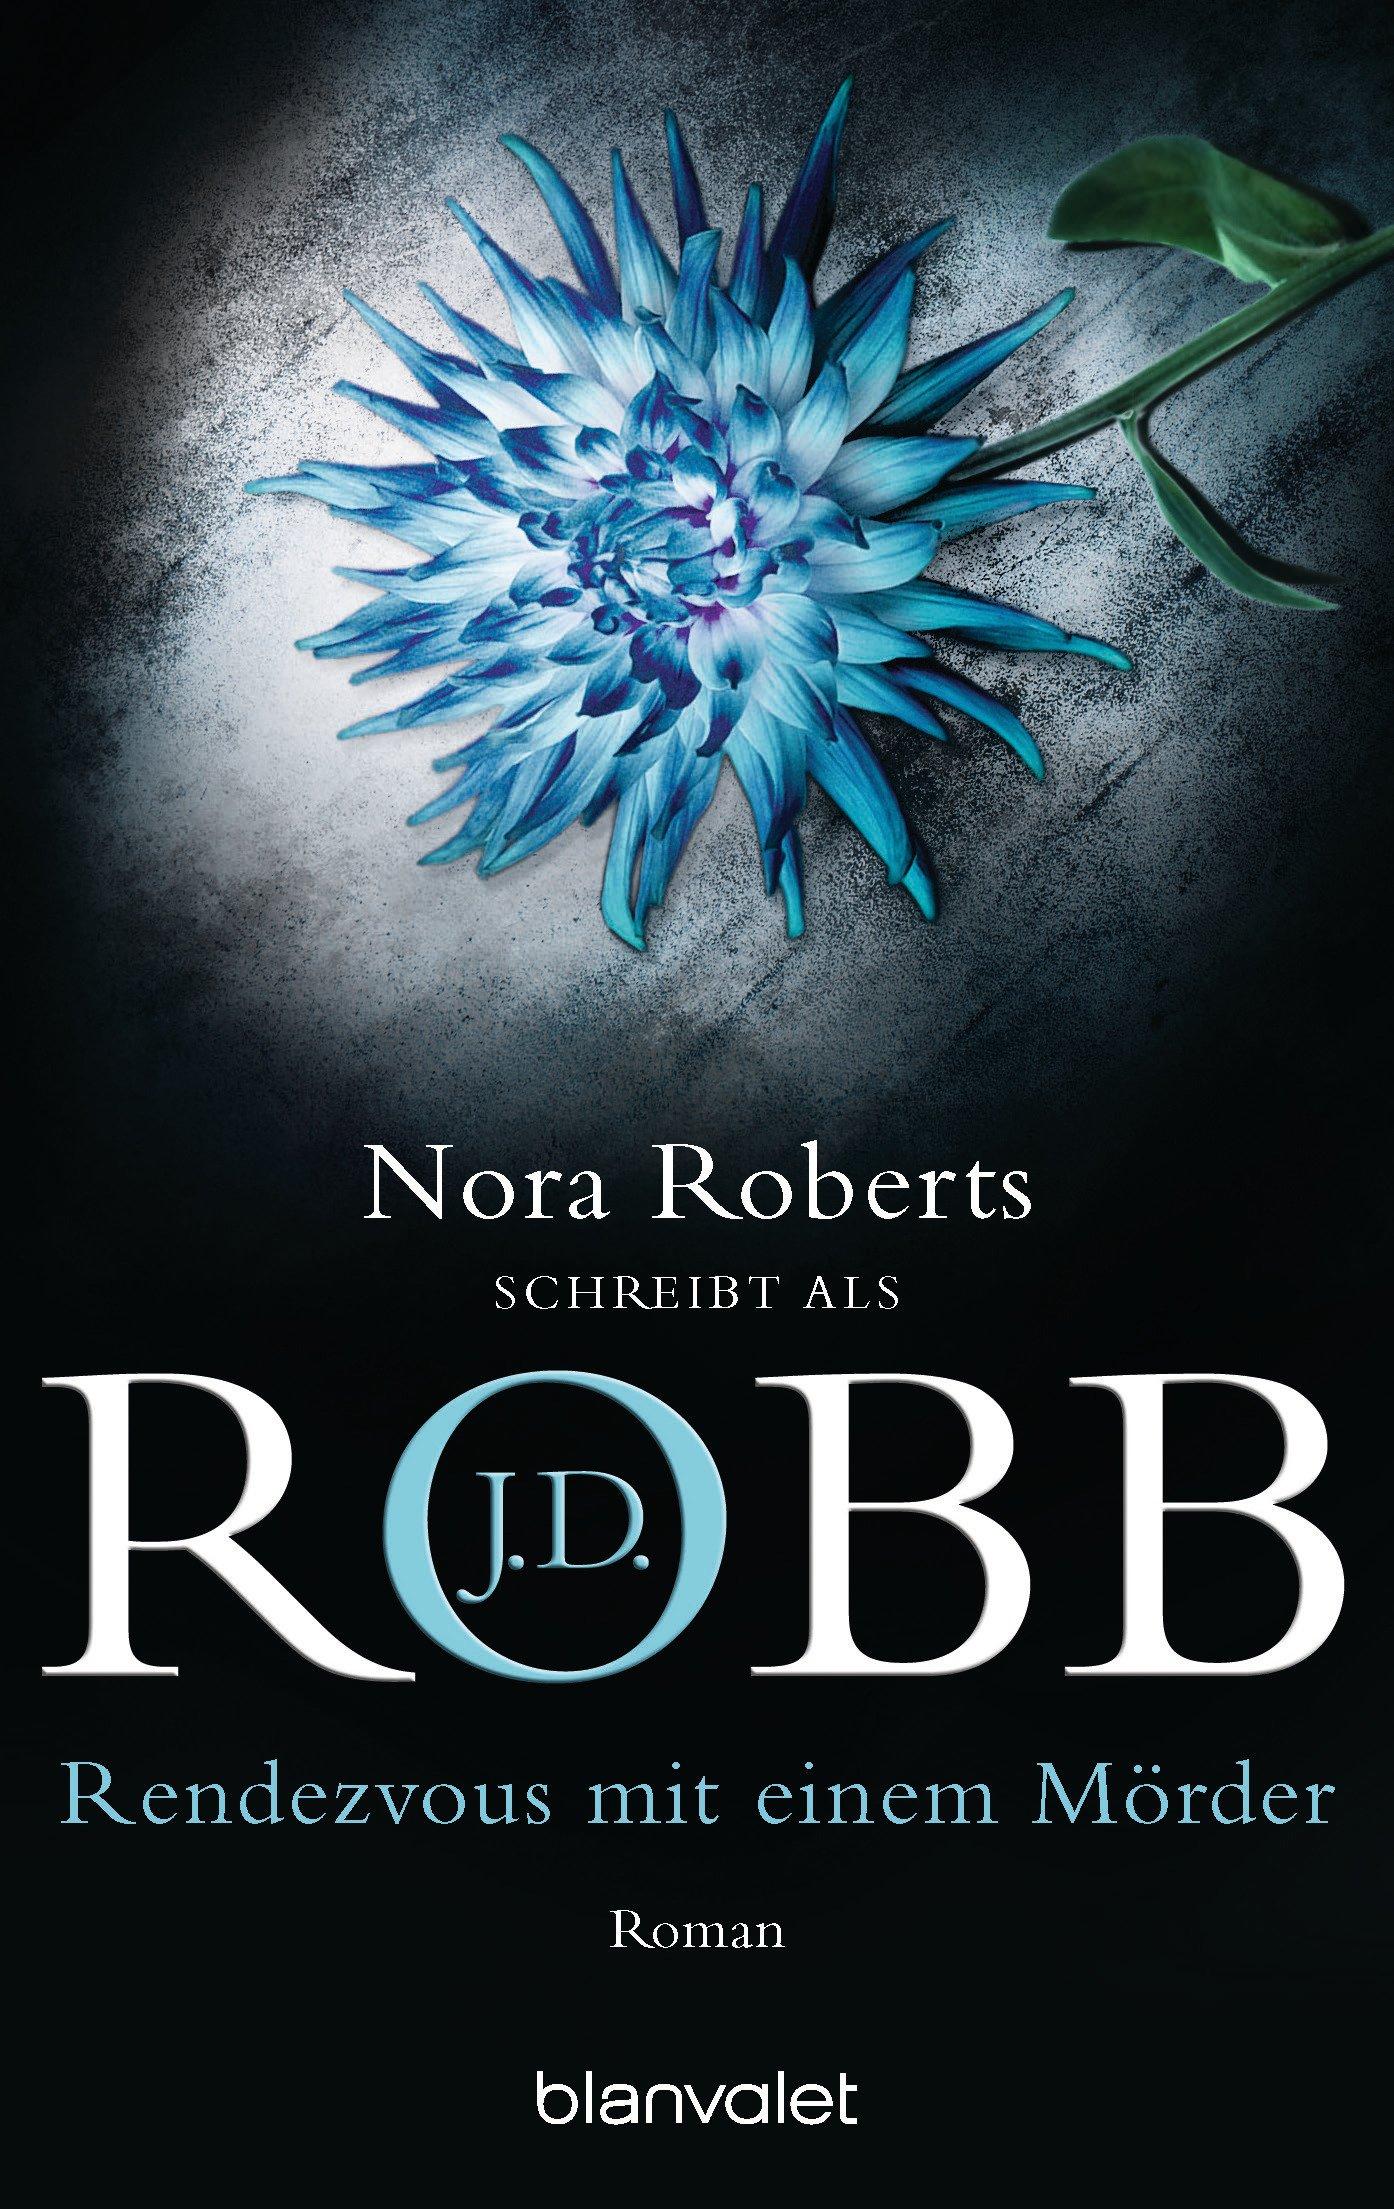 Rendezvous mit einem Mörder: Amazon.de: J. D. Robb, Uta Hege: Bücher